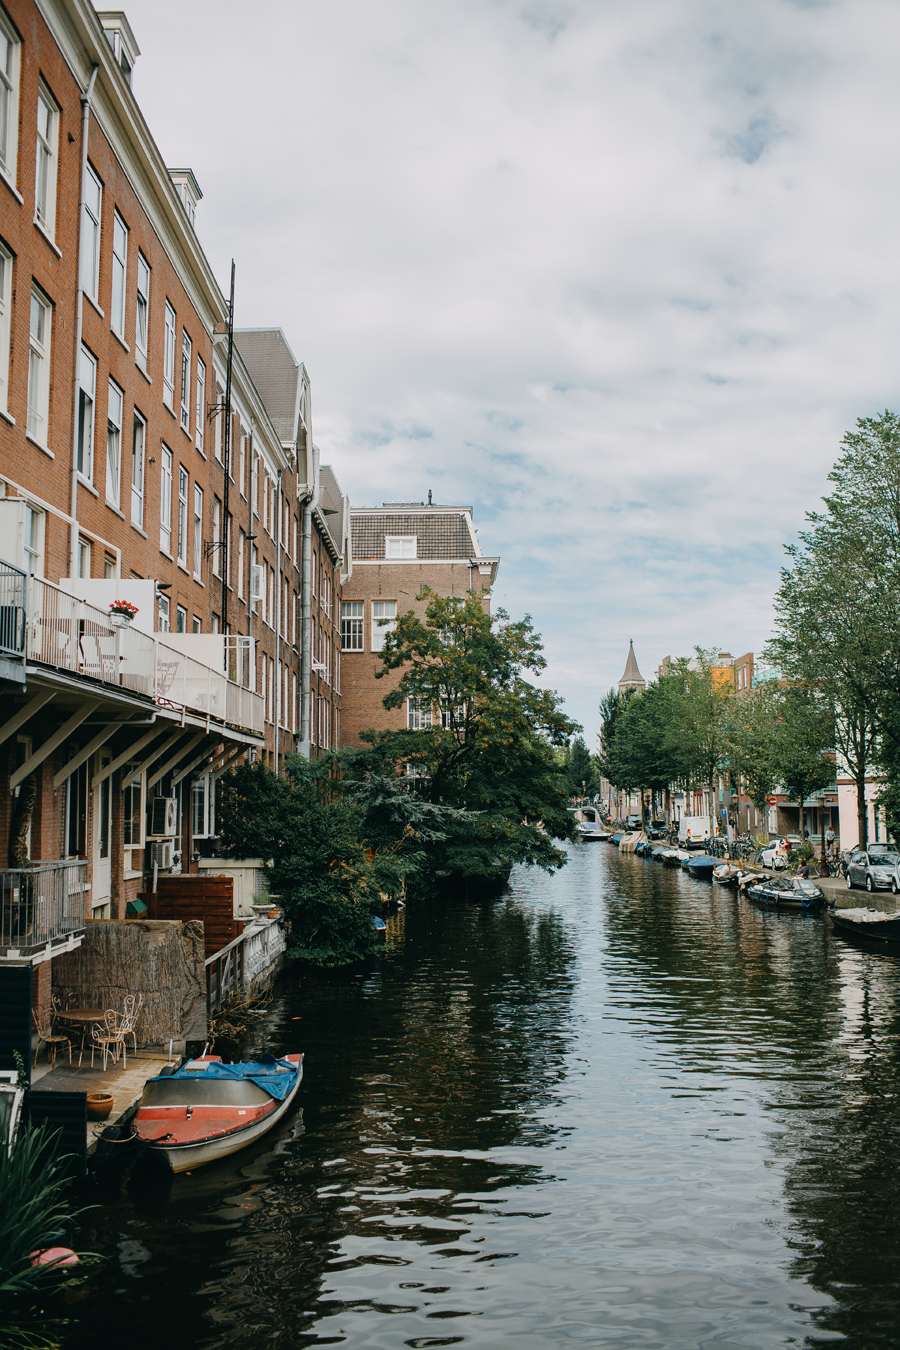 024-amsterdam-bikes-travel-photography.jpg